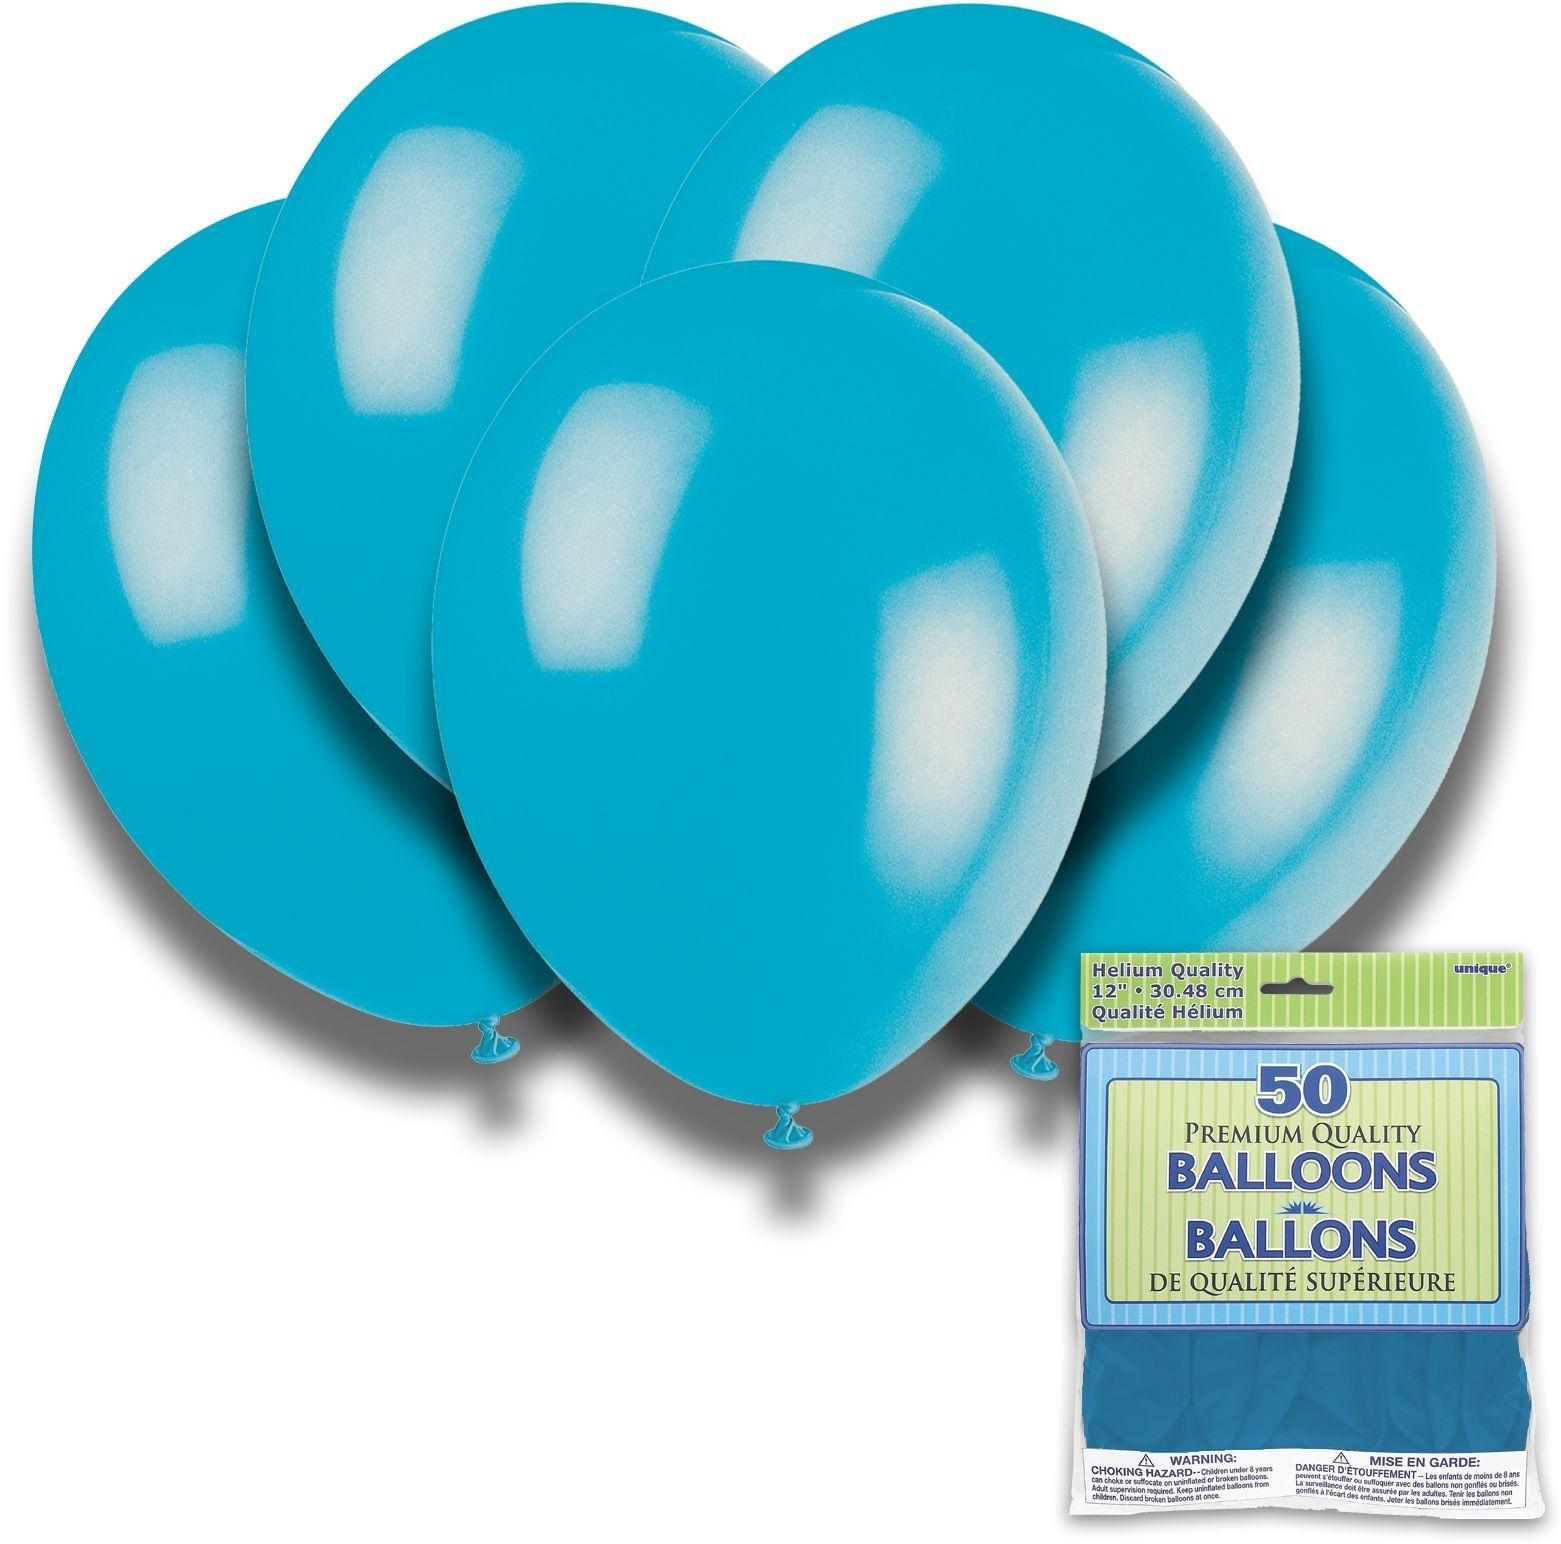 Argos - Turquoise - 12 Inch Premium Balloons - Pack of 50